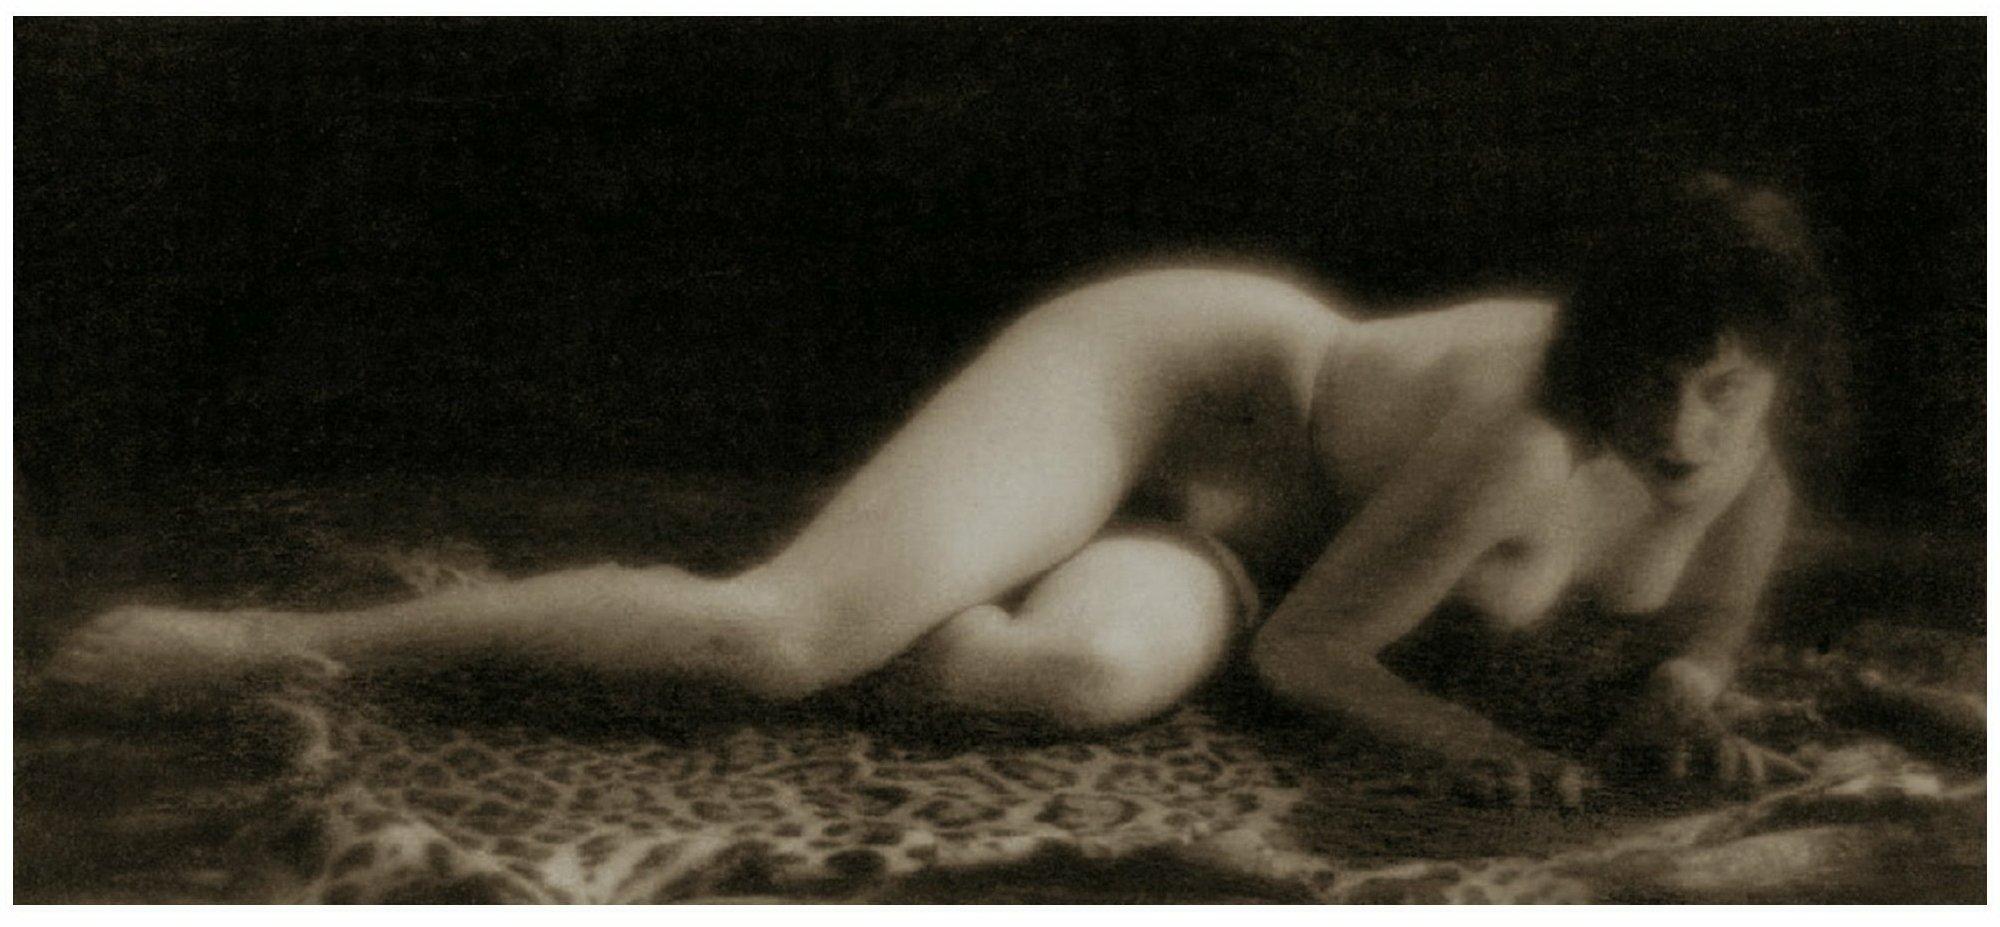 Эротика 30 годах 2 фотография